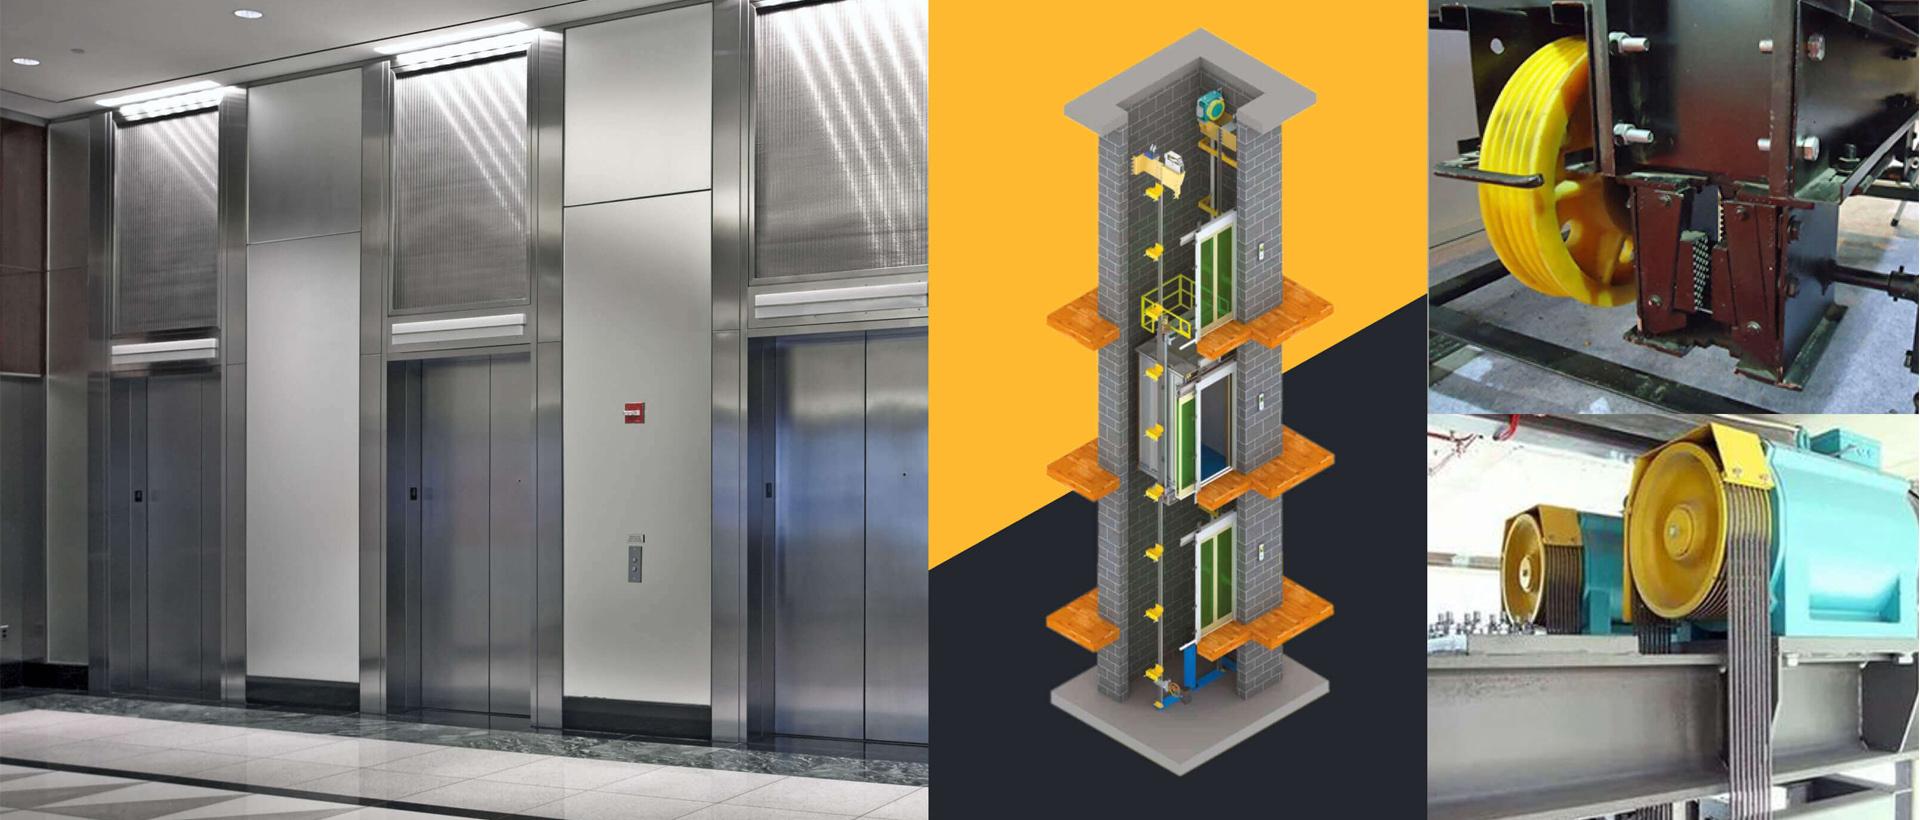 Machine Room less elevator banner